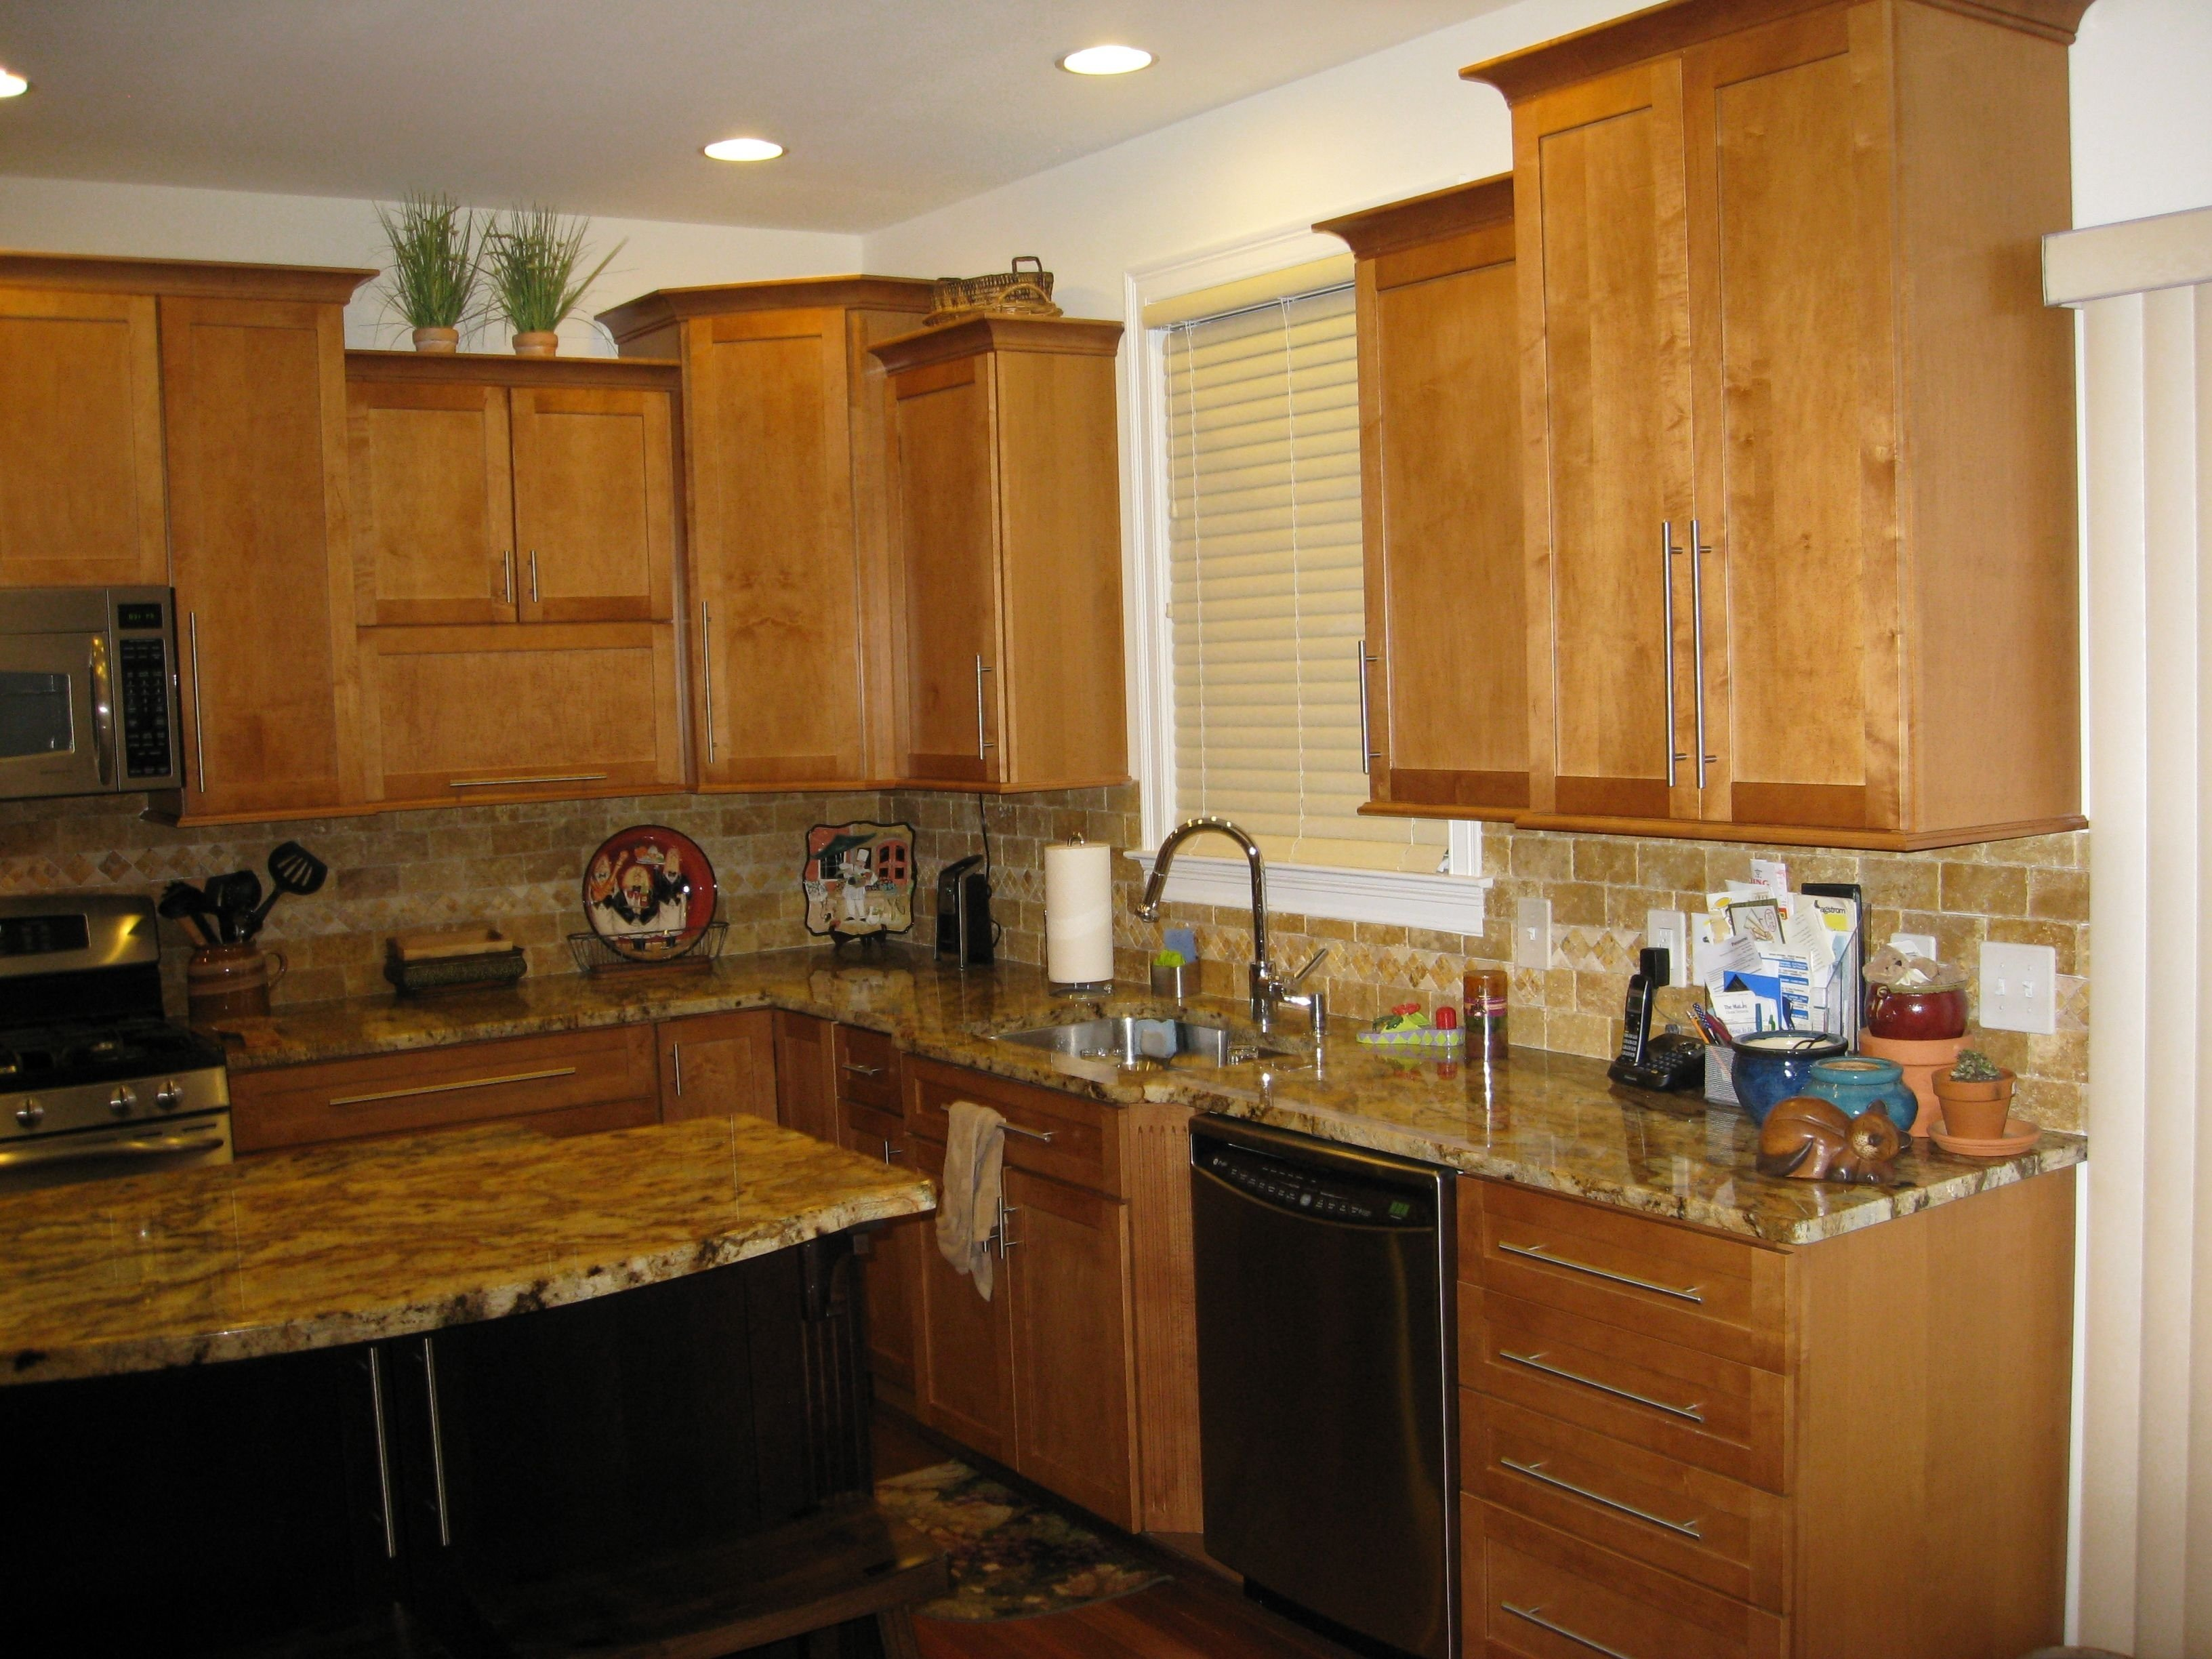 10 Amazing New Venetian Gold Granite Backsplash Ideas light maple cabinets with new venetian gold granite google search 2021